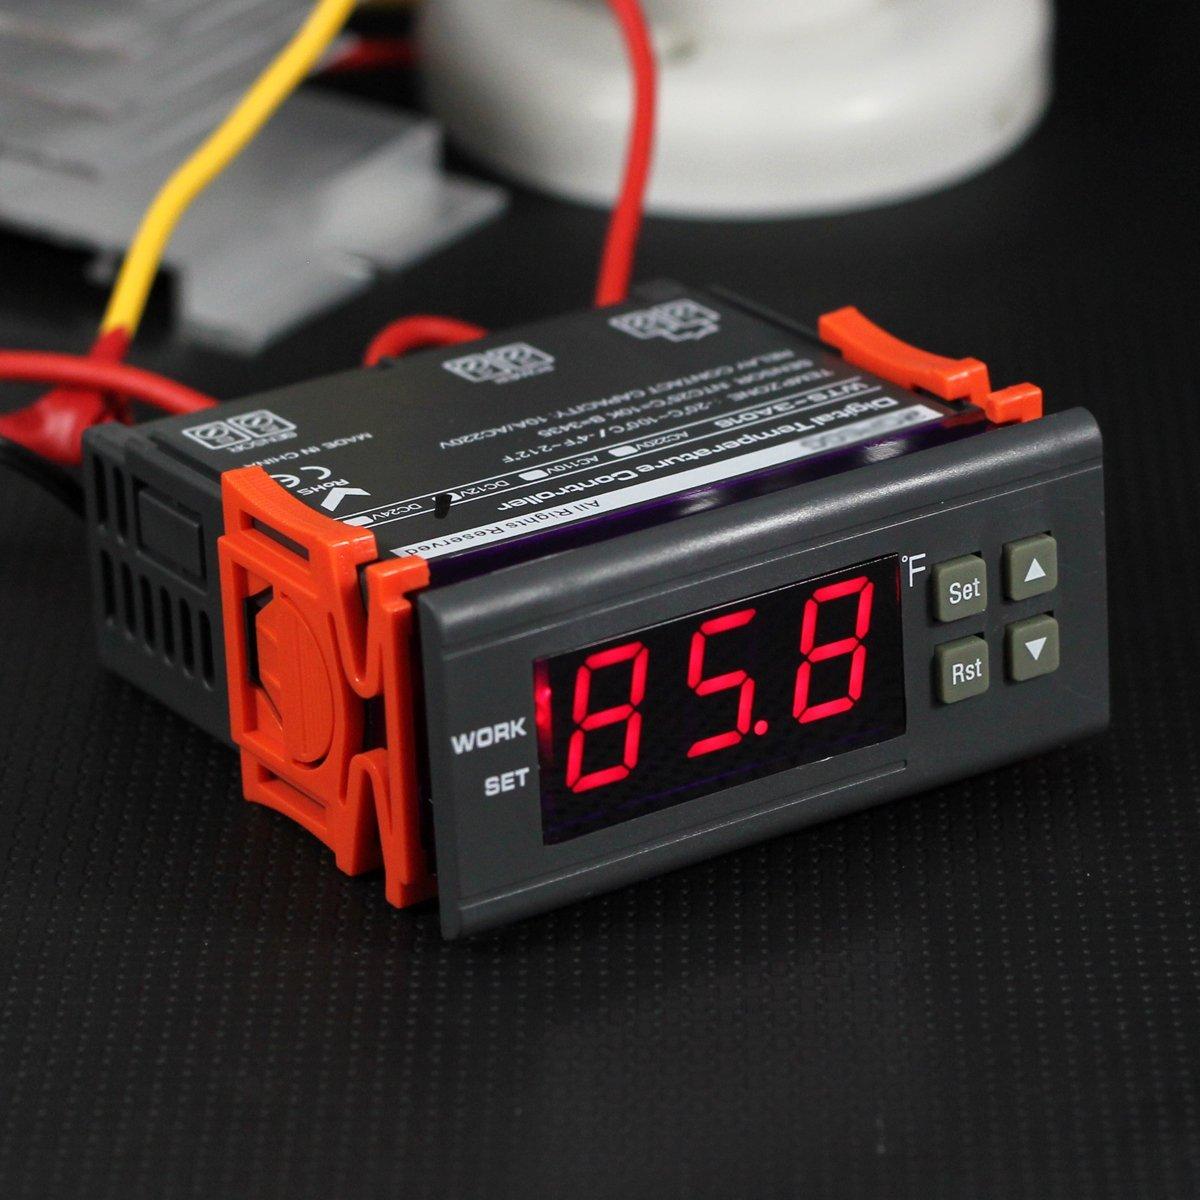 Bayite Ac 110v Fahrenheit Digital Temperature Controller 10a 1 Relay Wiring Diagram With Sensor